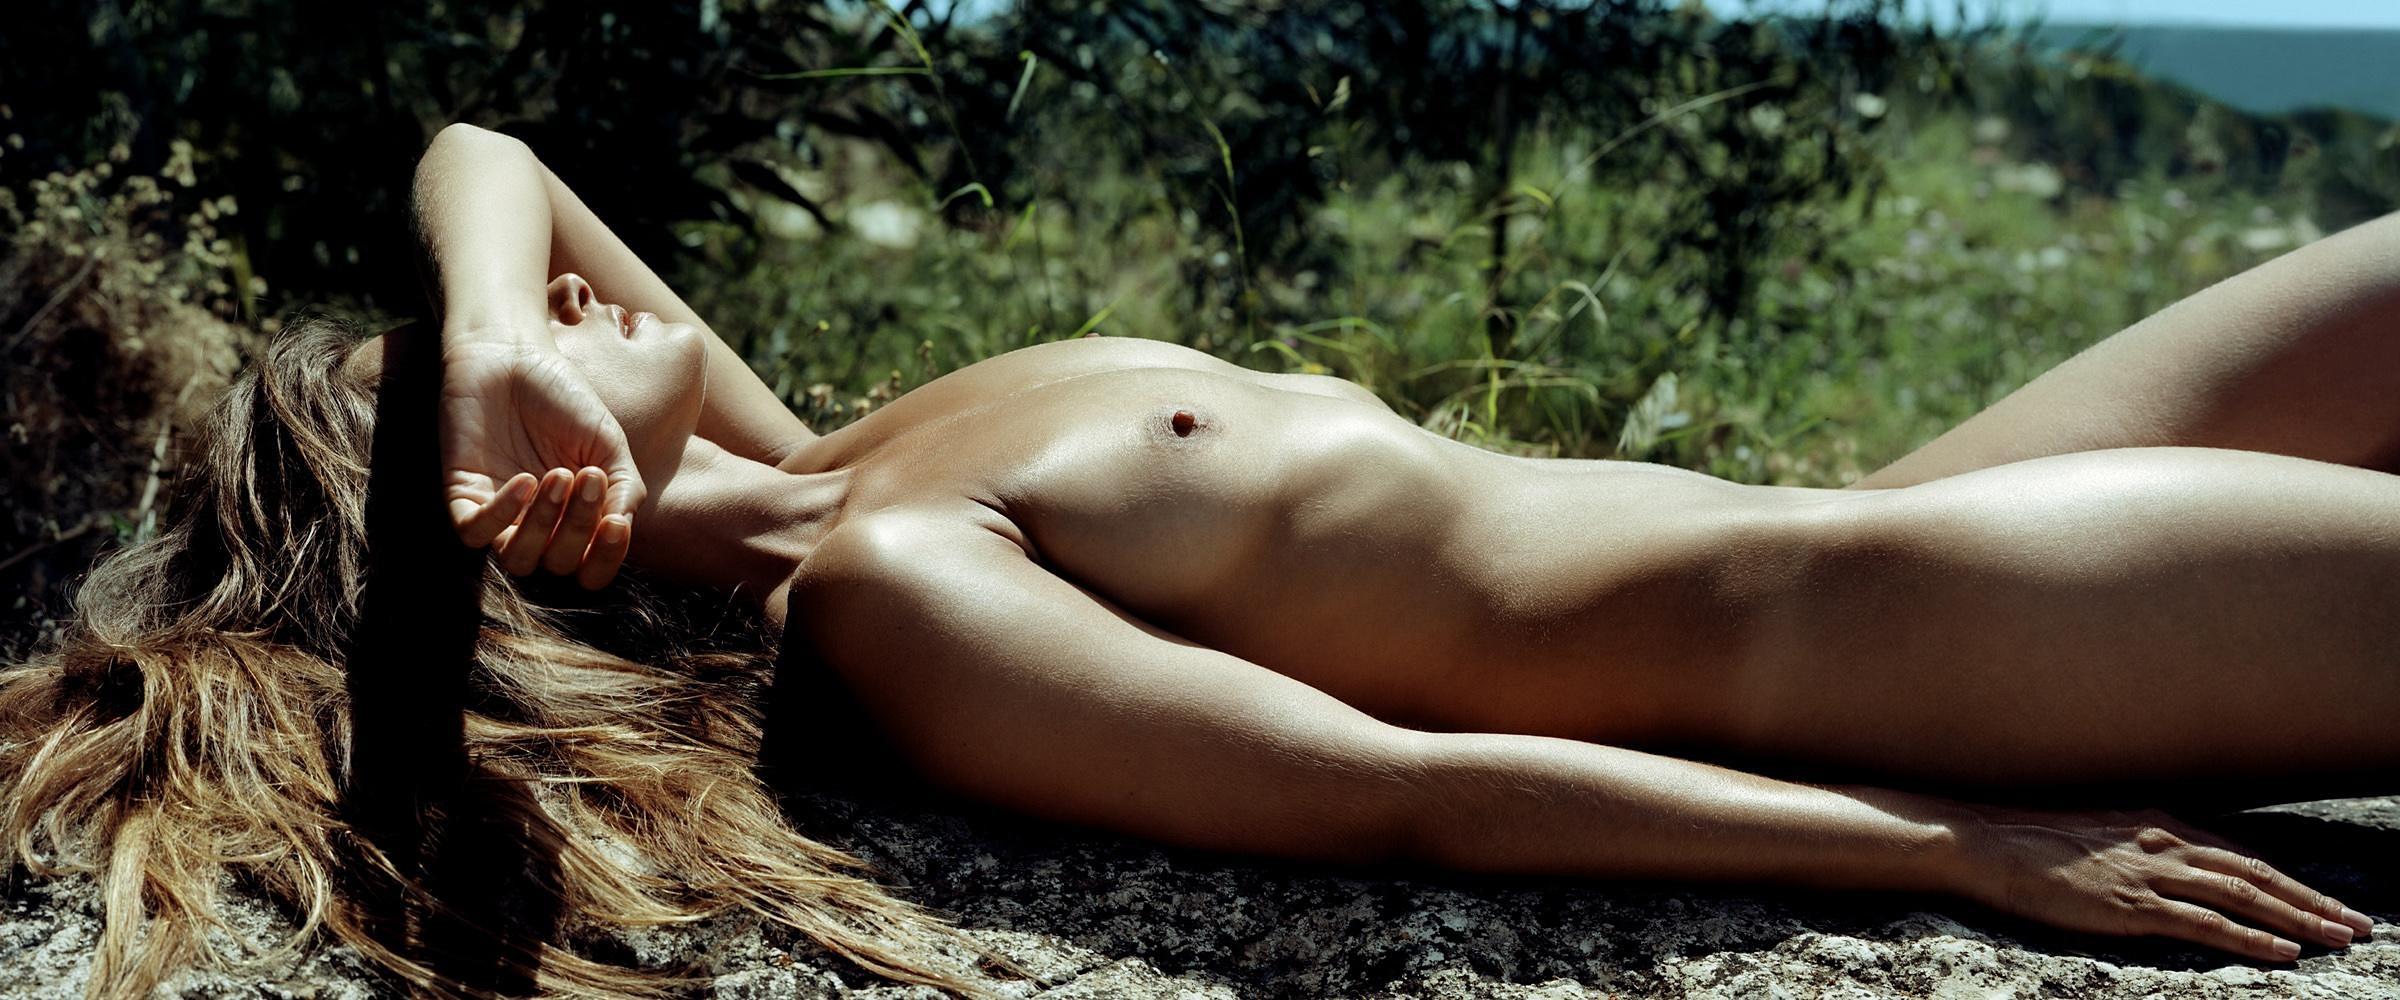 Jane krakowski autographed nude in bed signed photo psadna